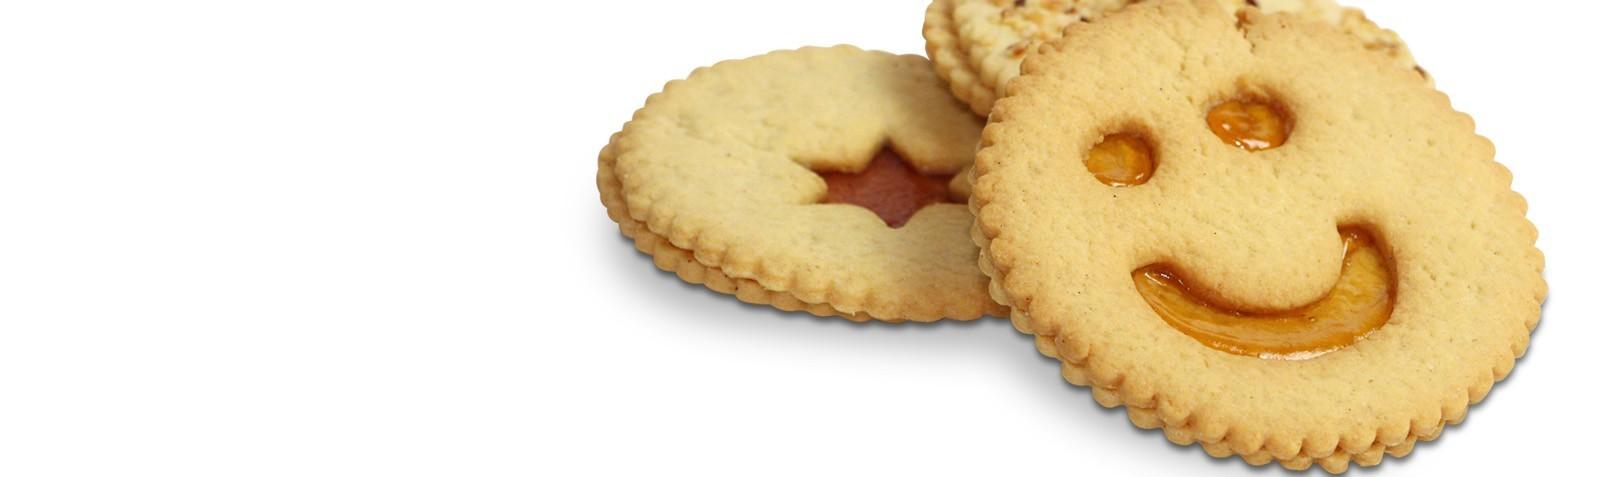 Dolci e biscotti artigianali